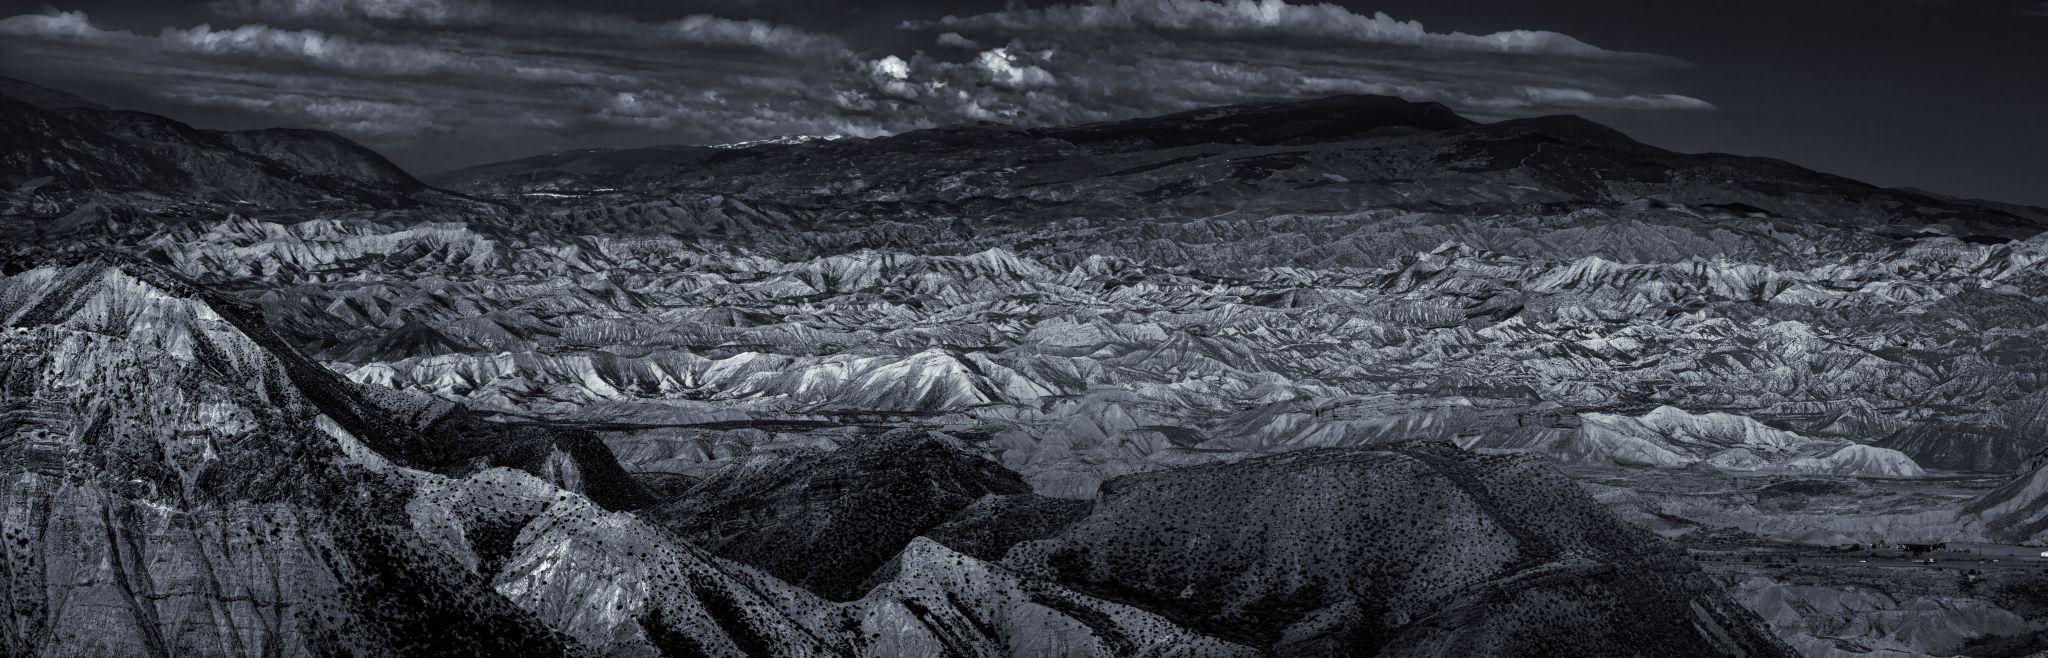 Mirador Desierto de Tabernas, Spain